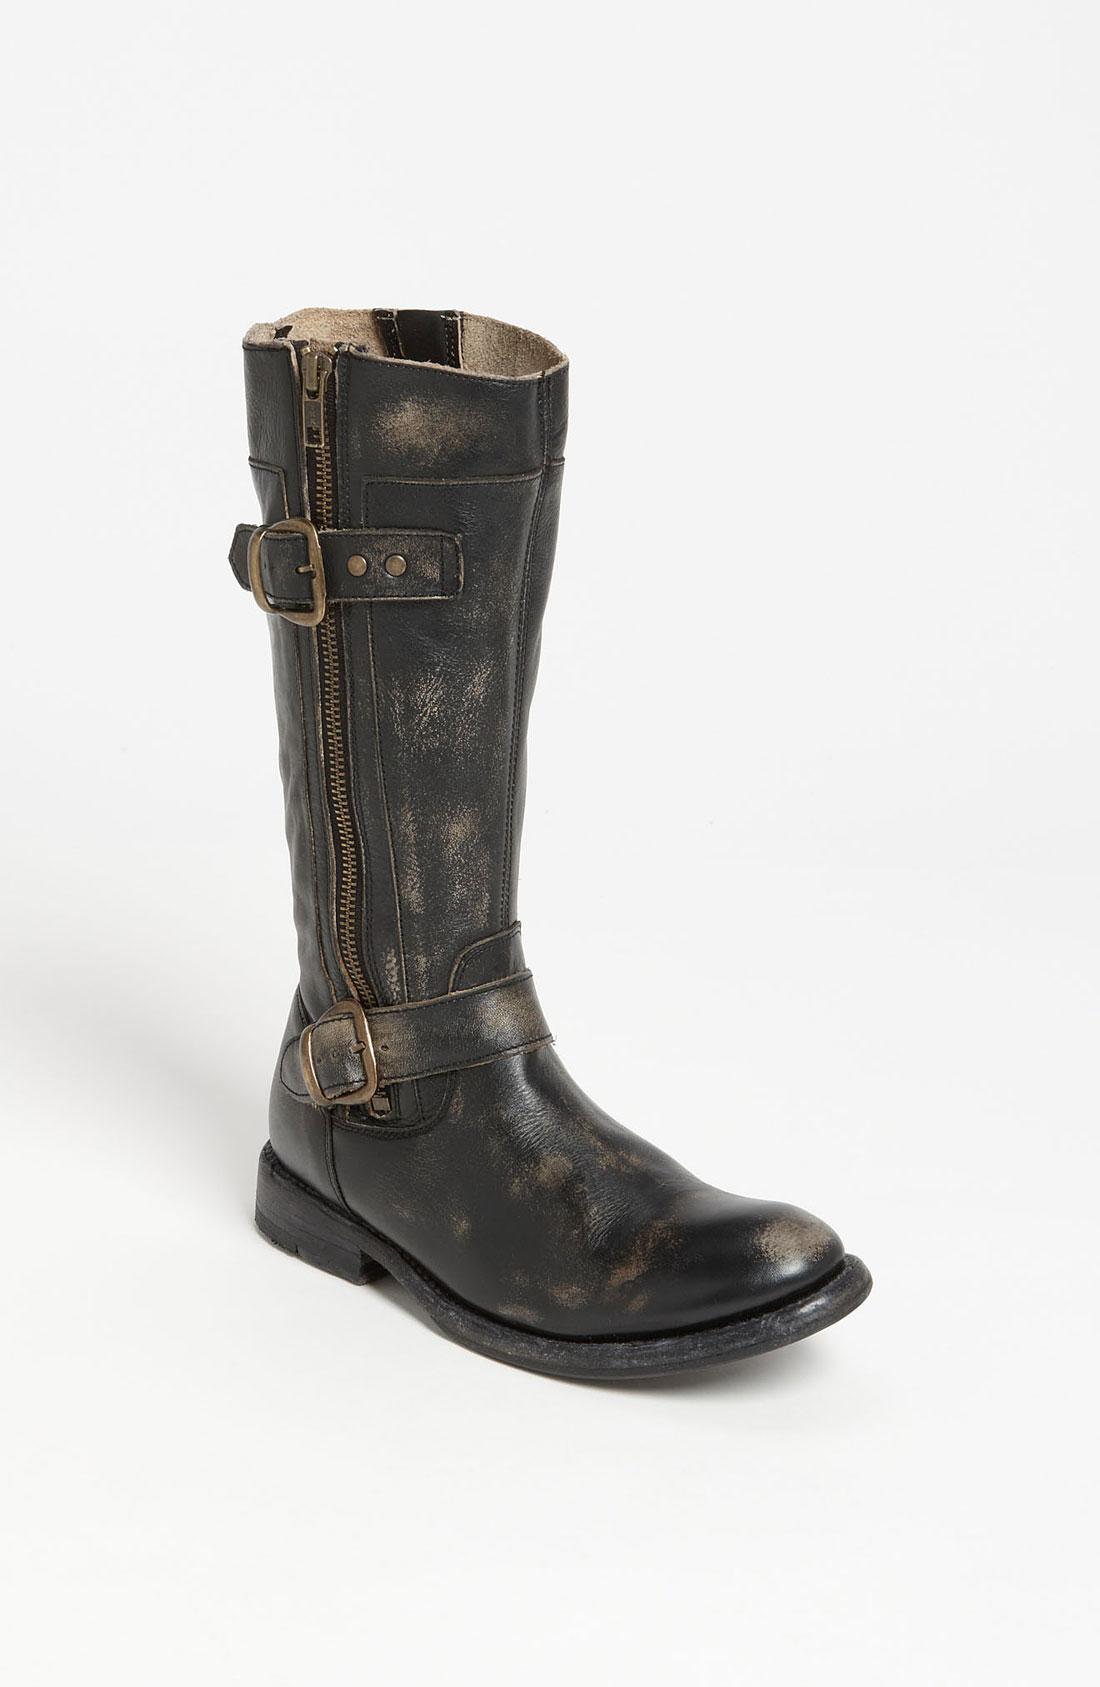 Bed Stu Gogo Boots Black